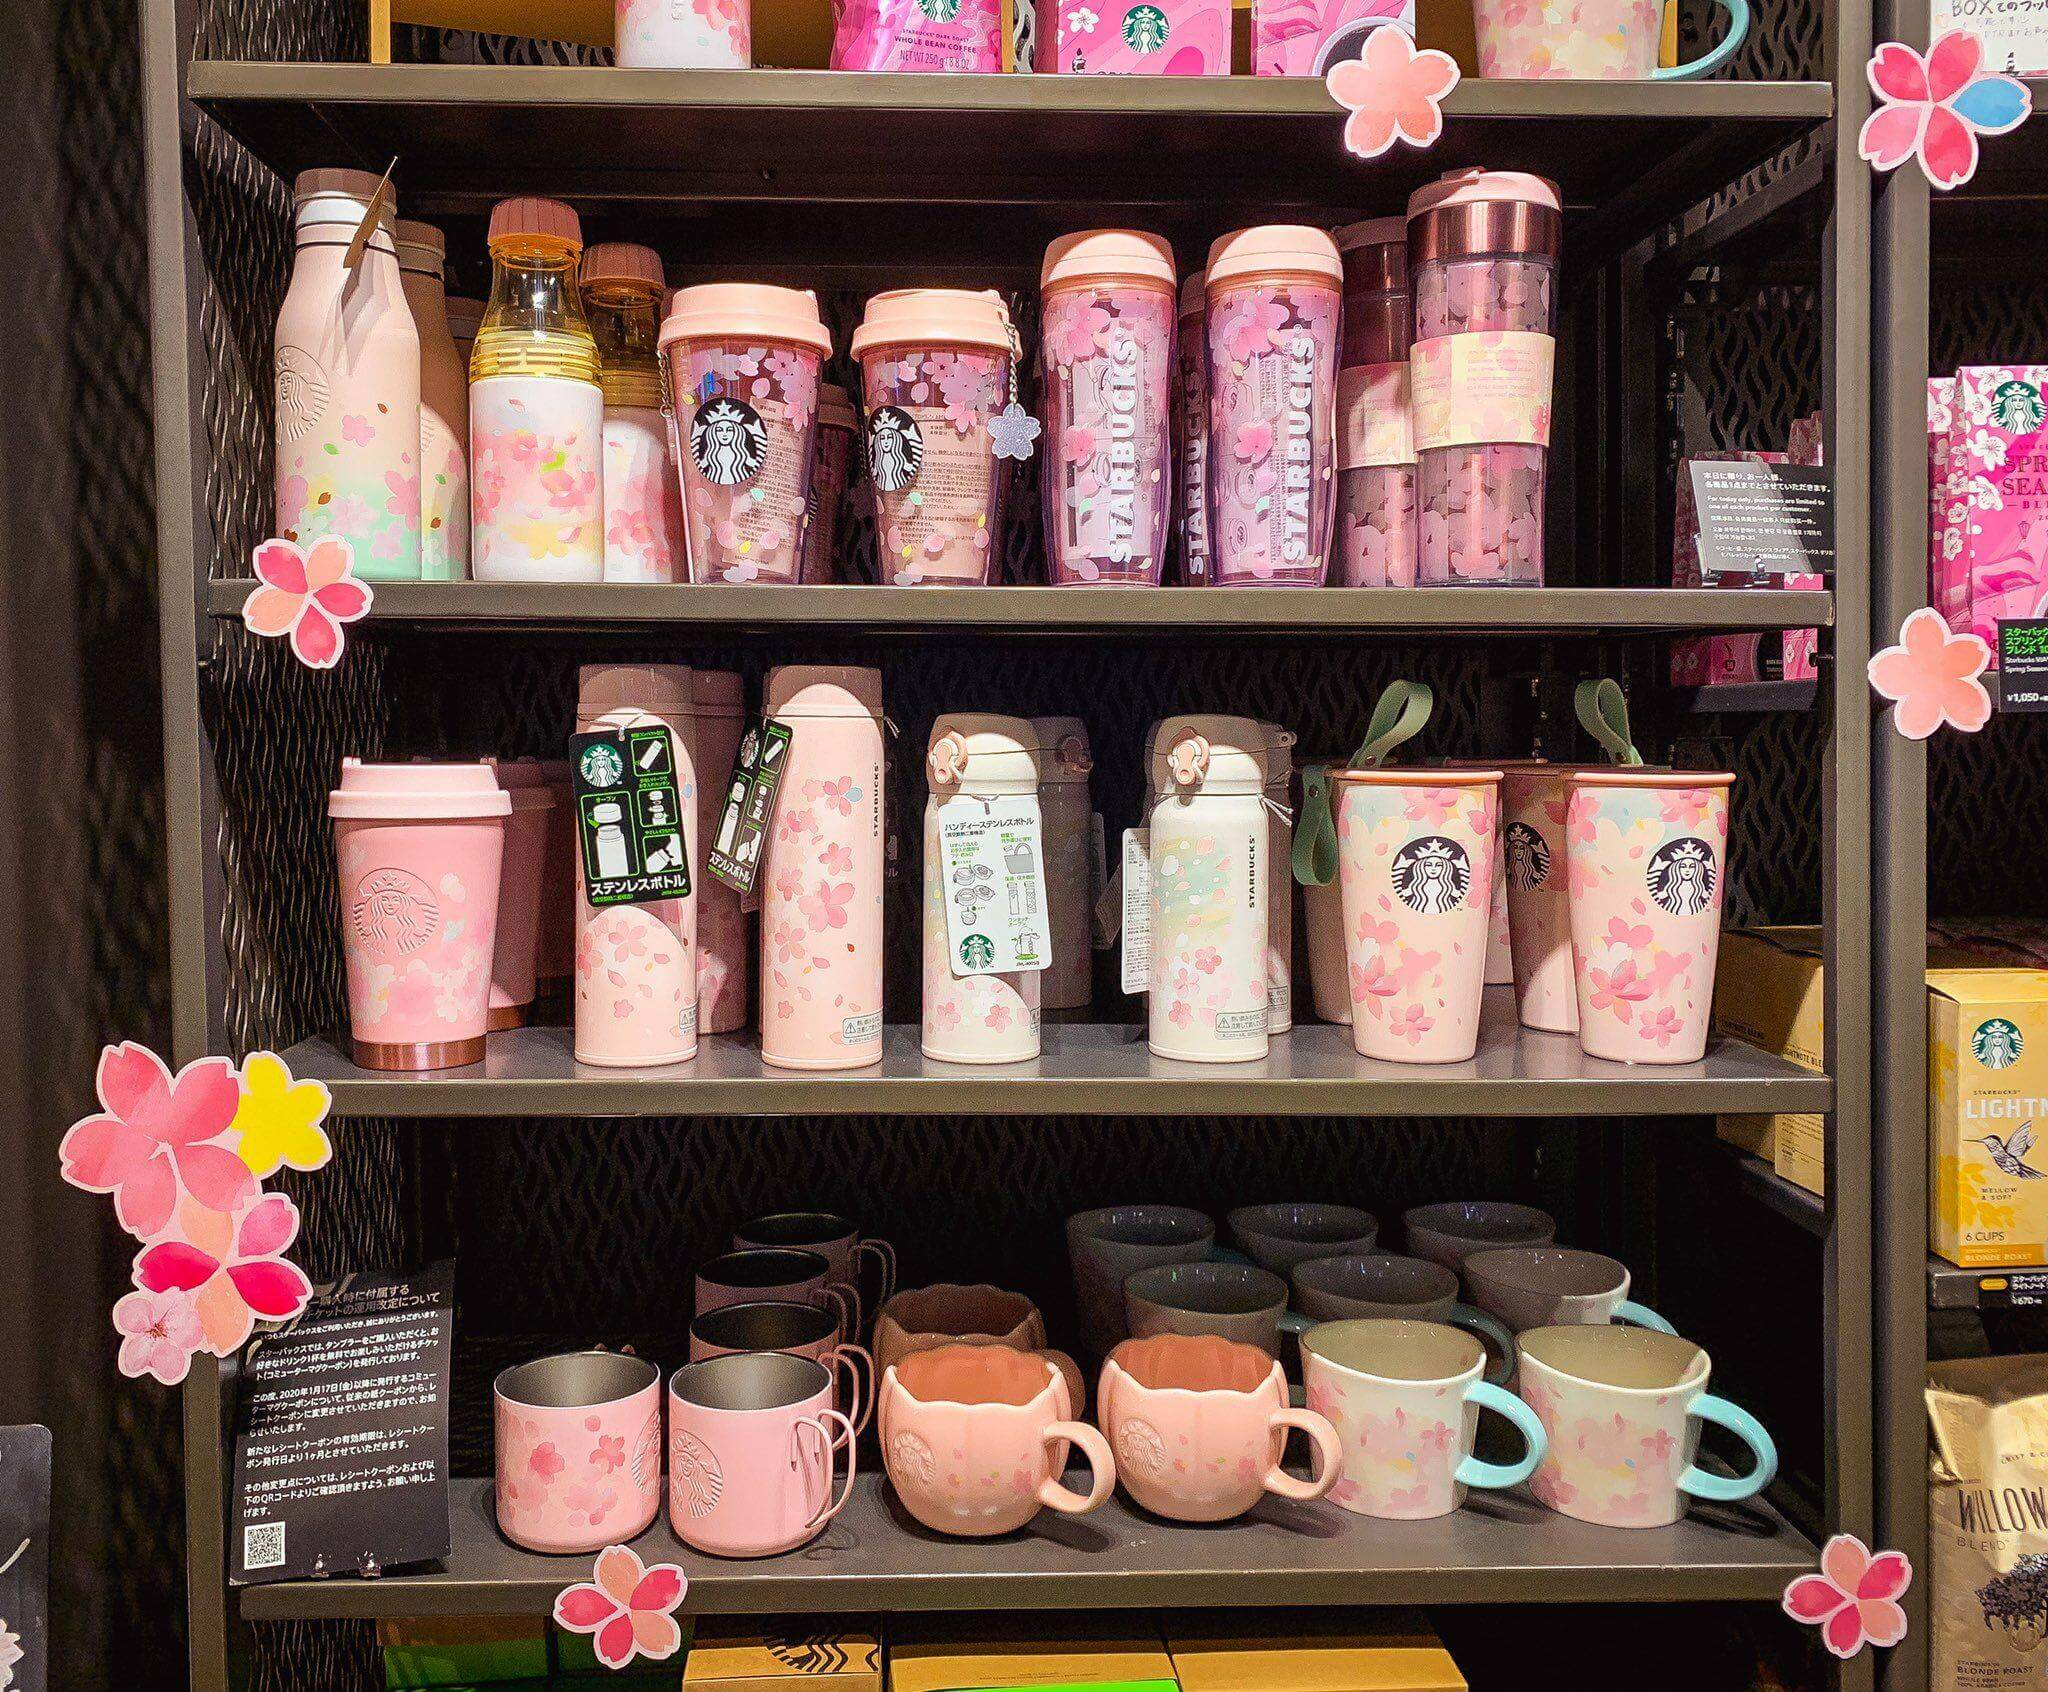 Starbucks Japan's brand new SAKURA merchandise collection